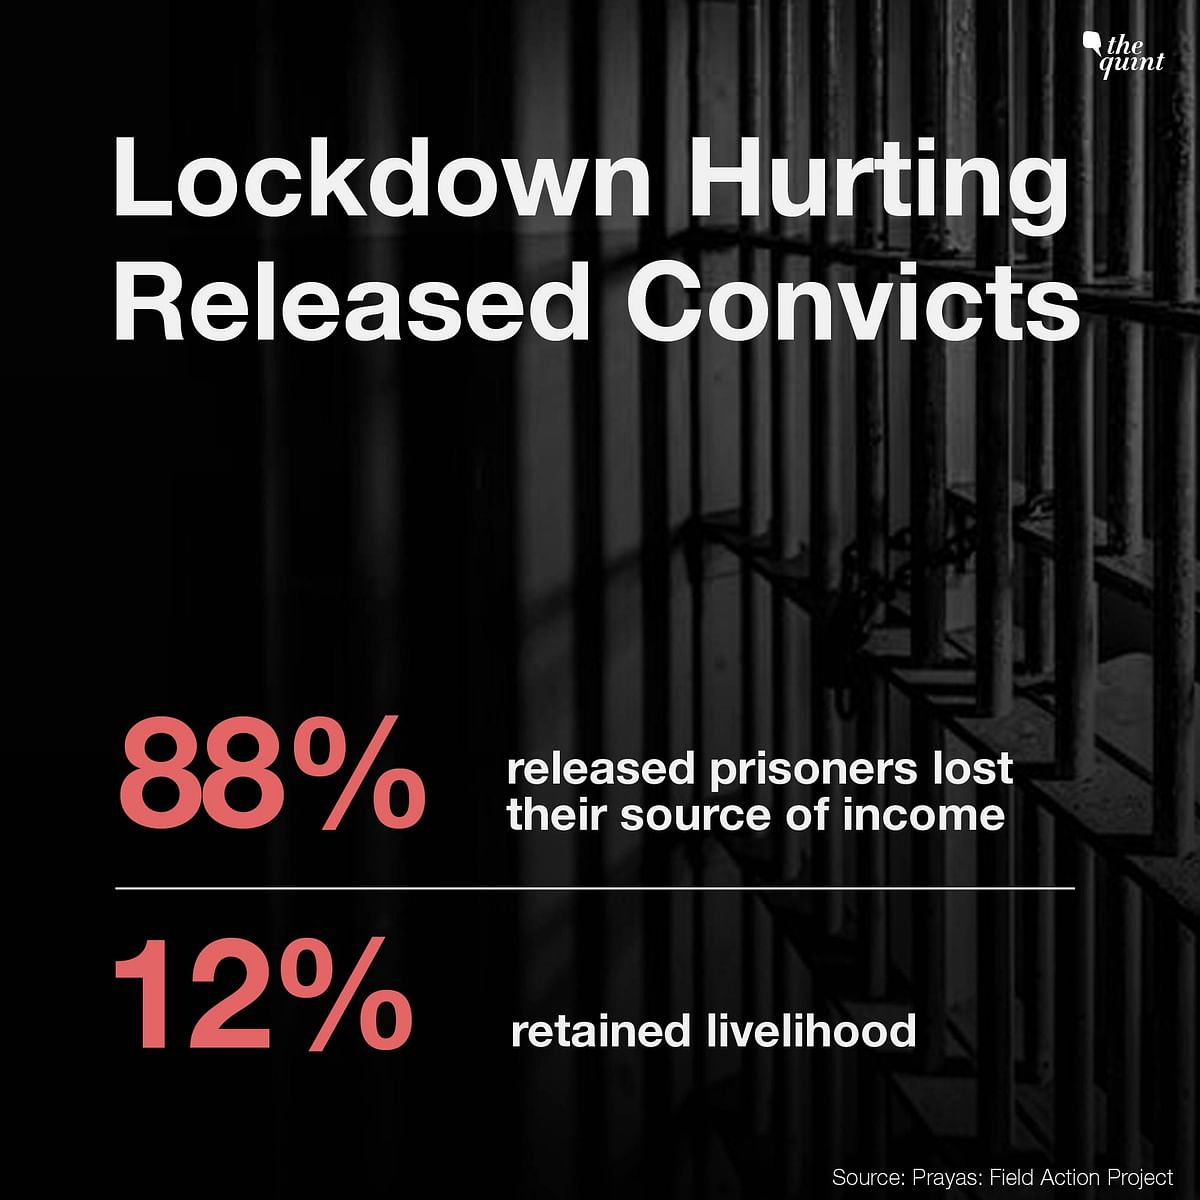 Post Lockdown, 88% Released Prisoners Face Livelihood Struggle